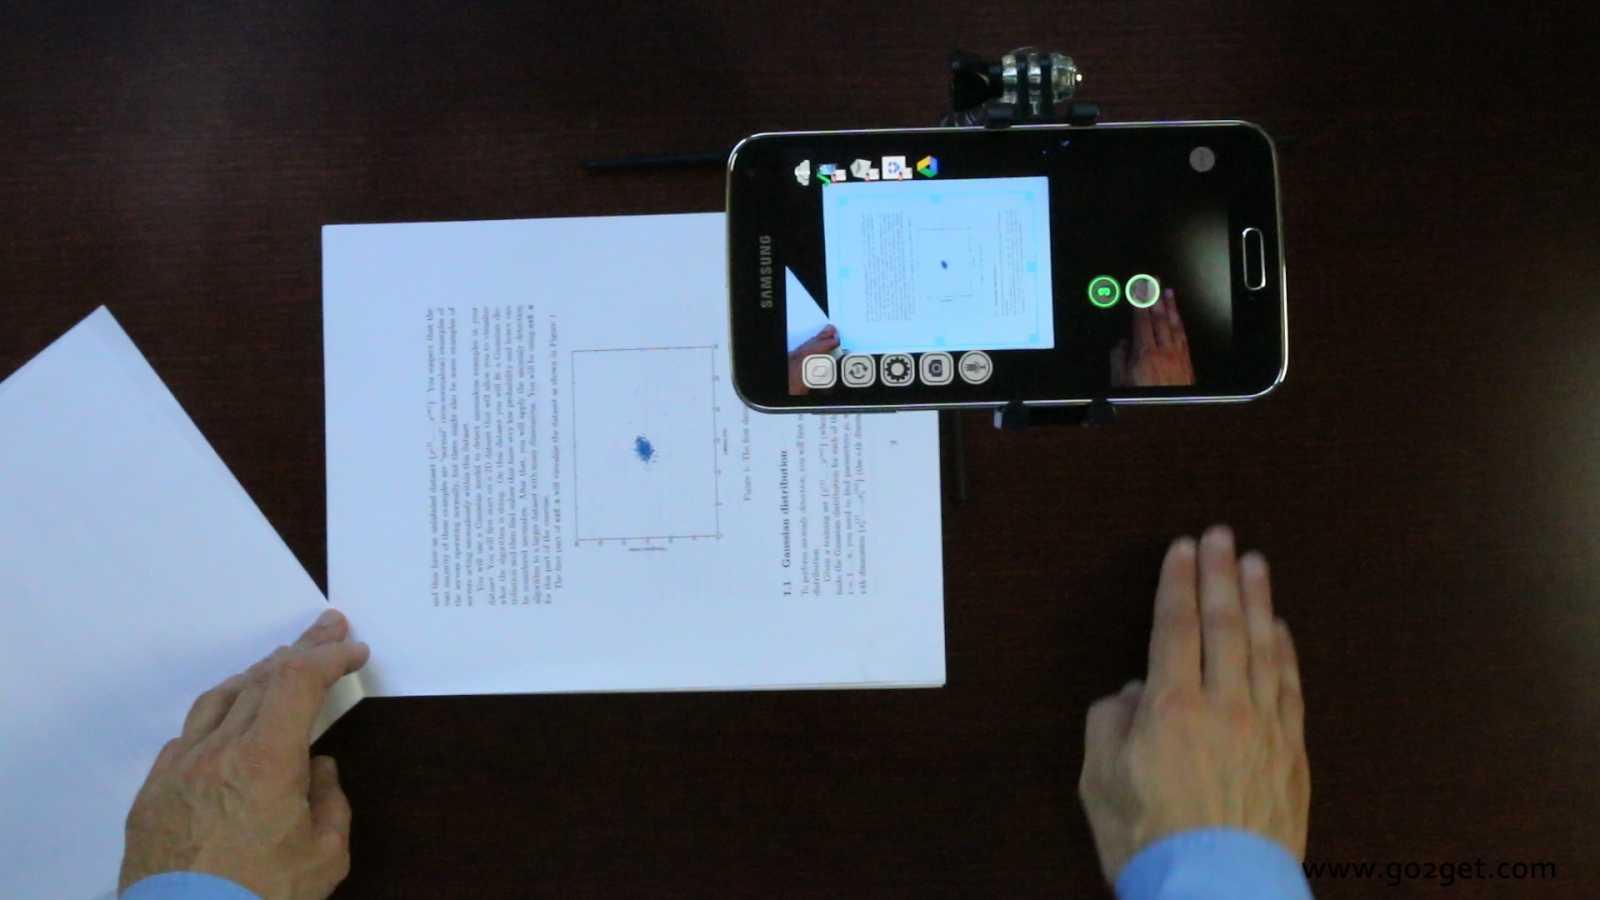 دانلود SkanApp hands-free doc scanner 3.76 - اسکنر دستی پر سرعت اندروید